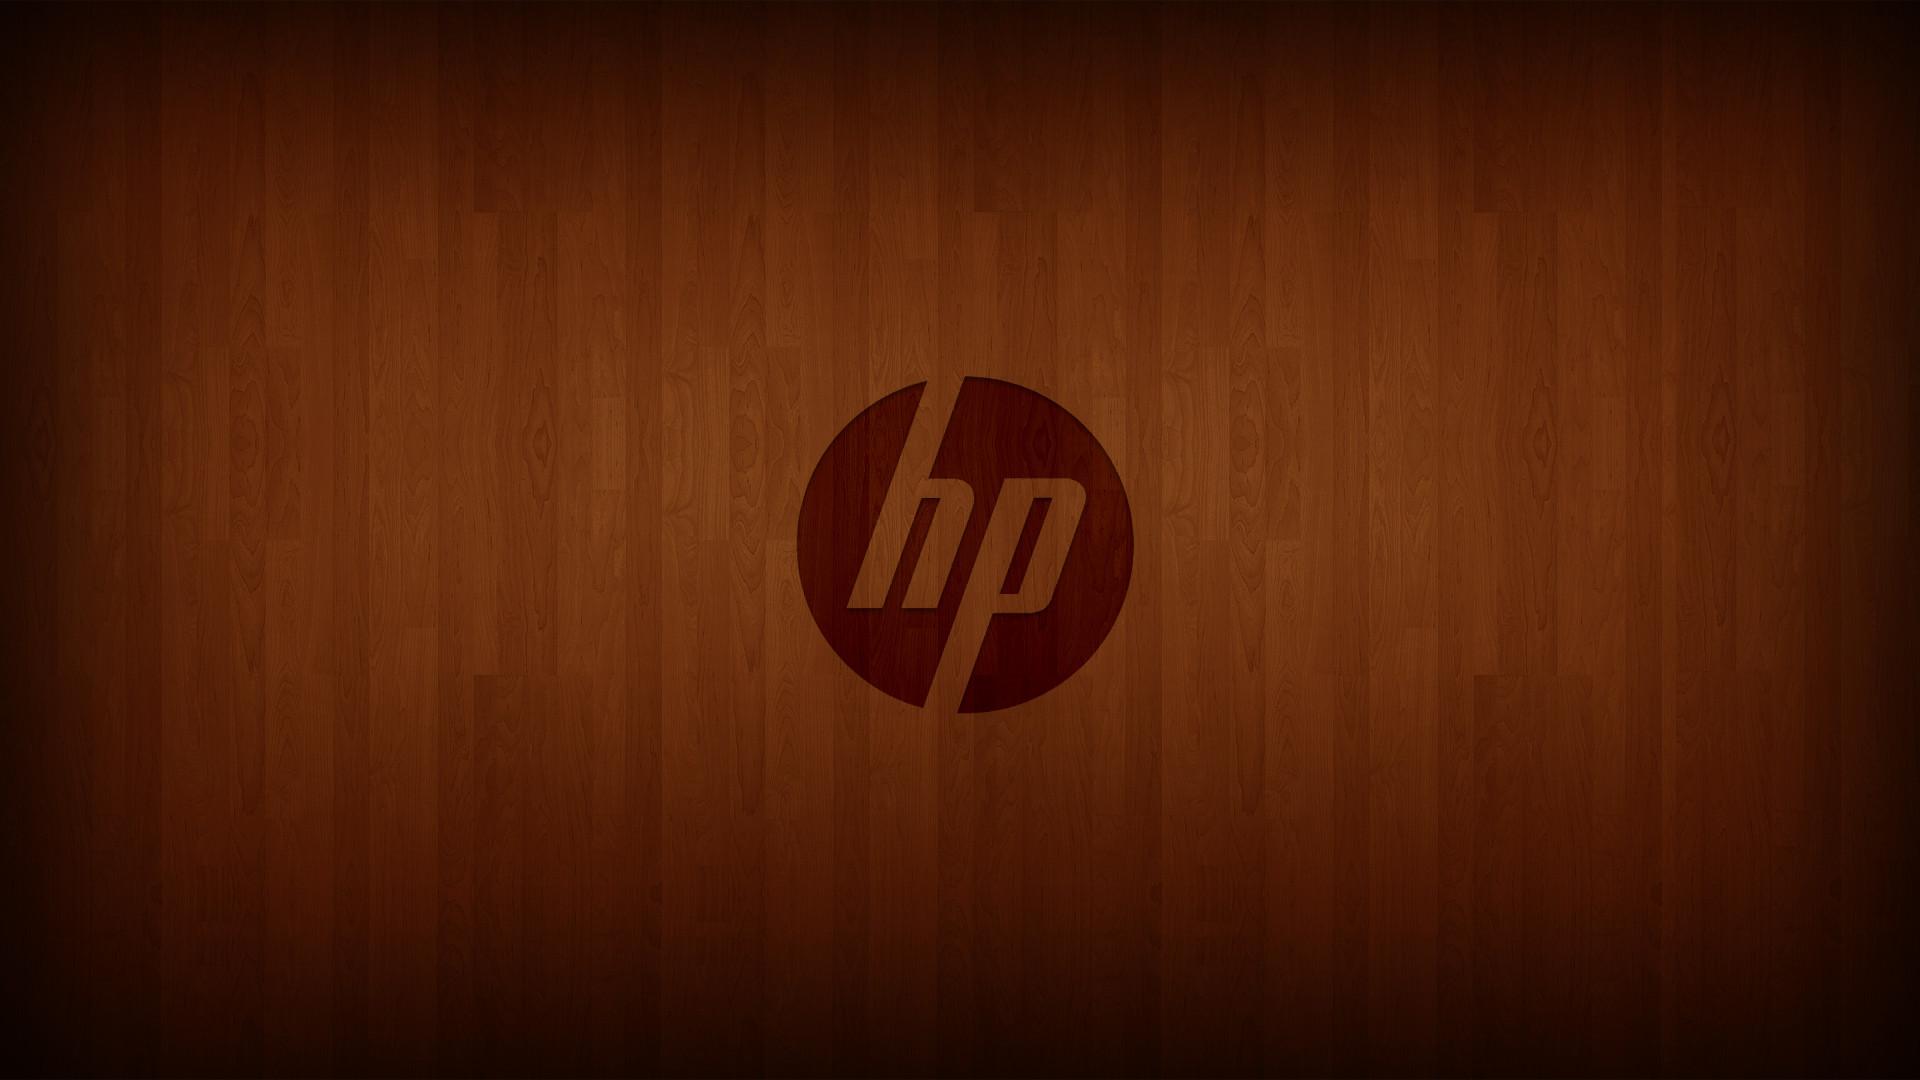 Free Wallpaper Download For Laptop Hp Vinny Oleo Vegetal Info